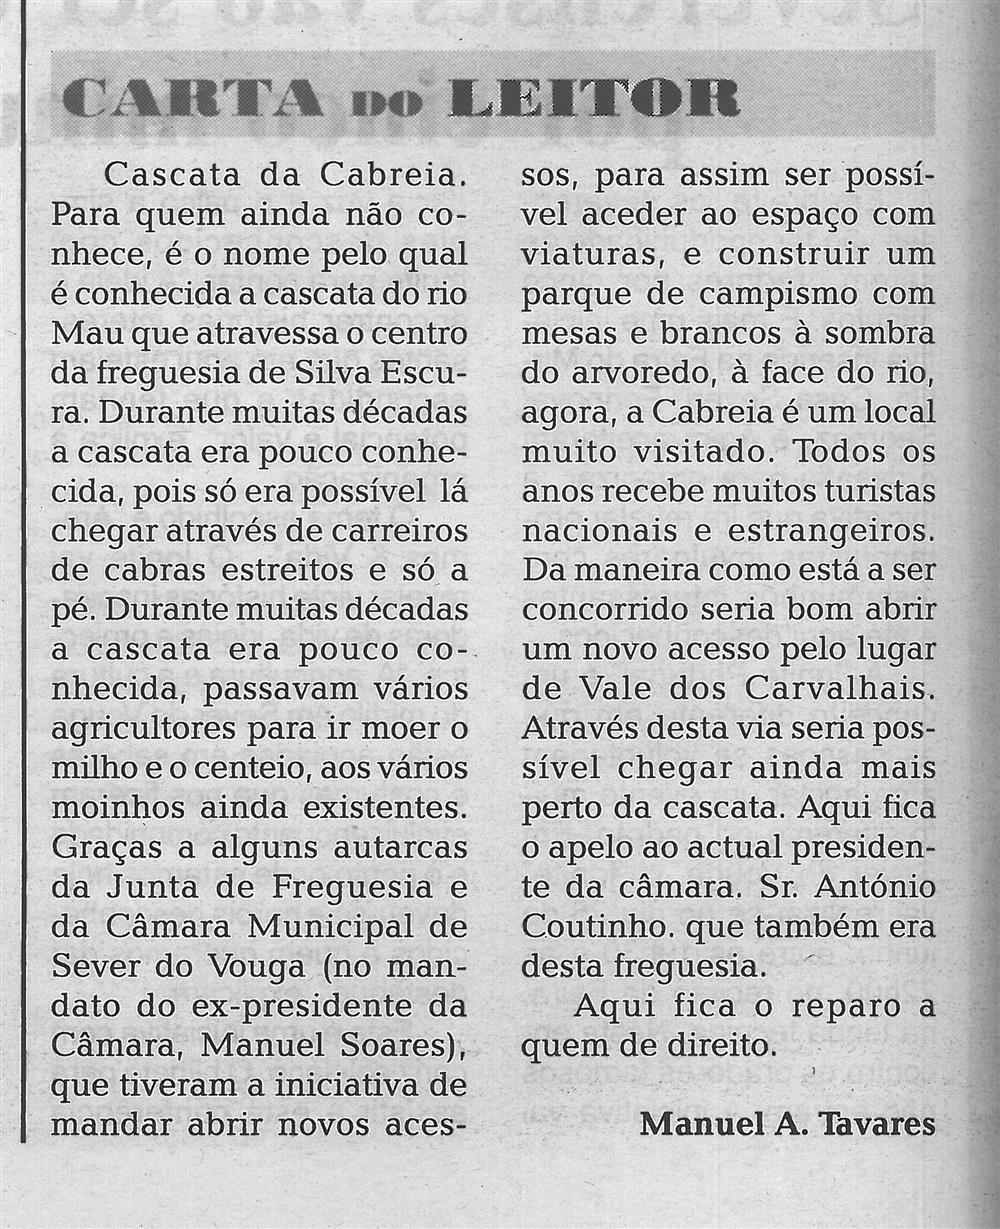 BV-2.ªjun.'16-p.6-Carta do leitor : Cascata da Cabreia.jpg